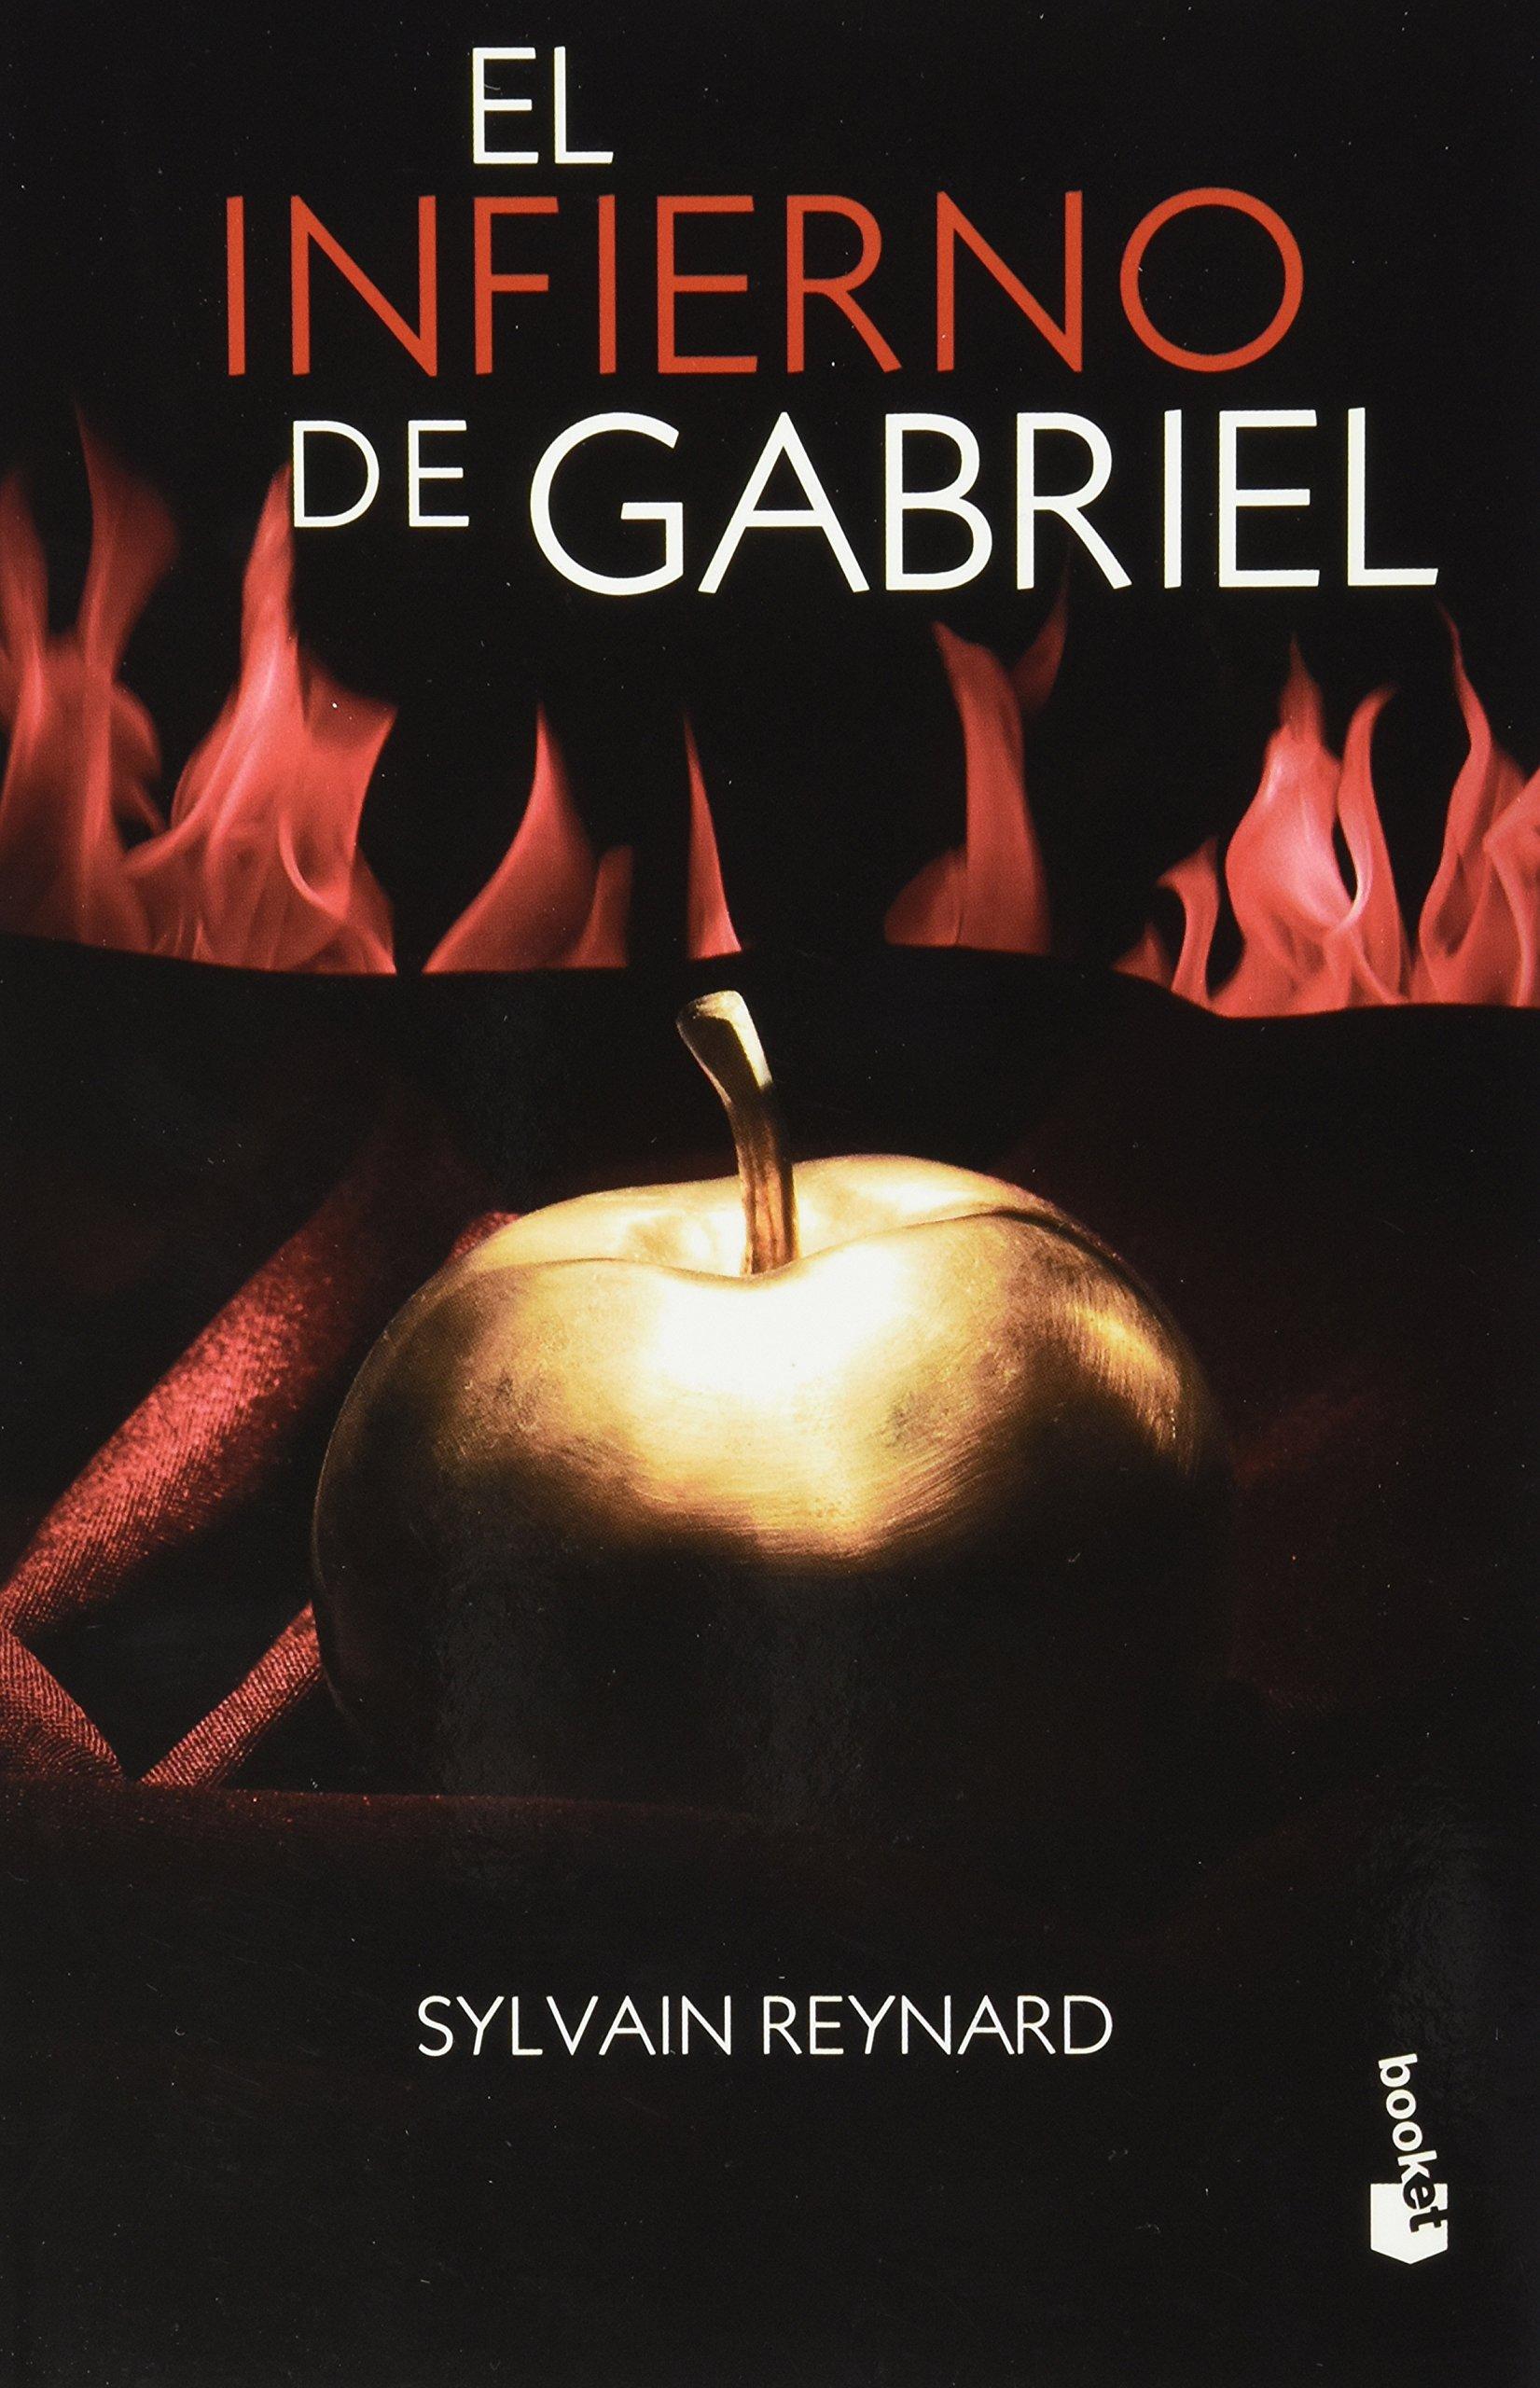 El Infierno De Gabriel Spanish Edition 9786070716225 Sylvain Reynard Books